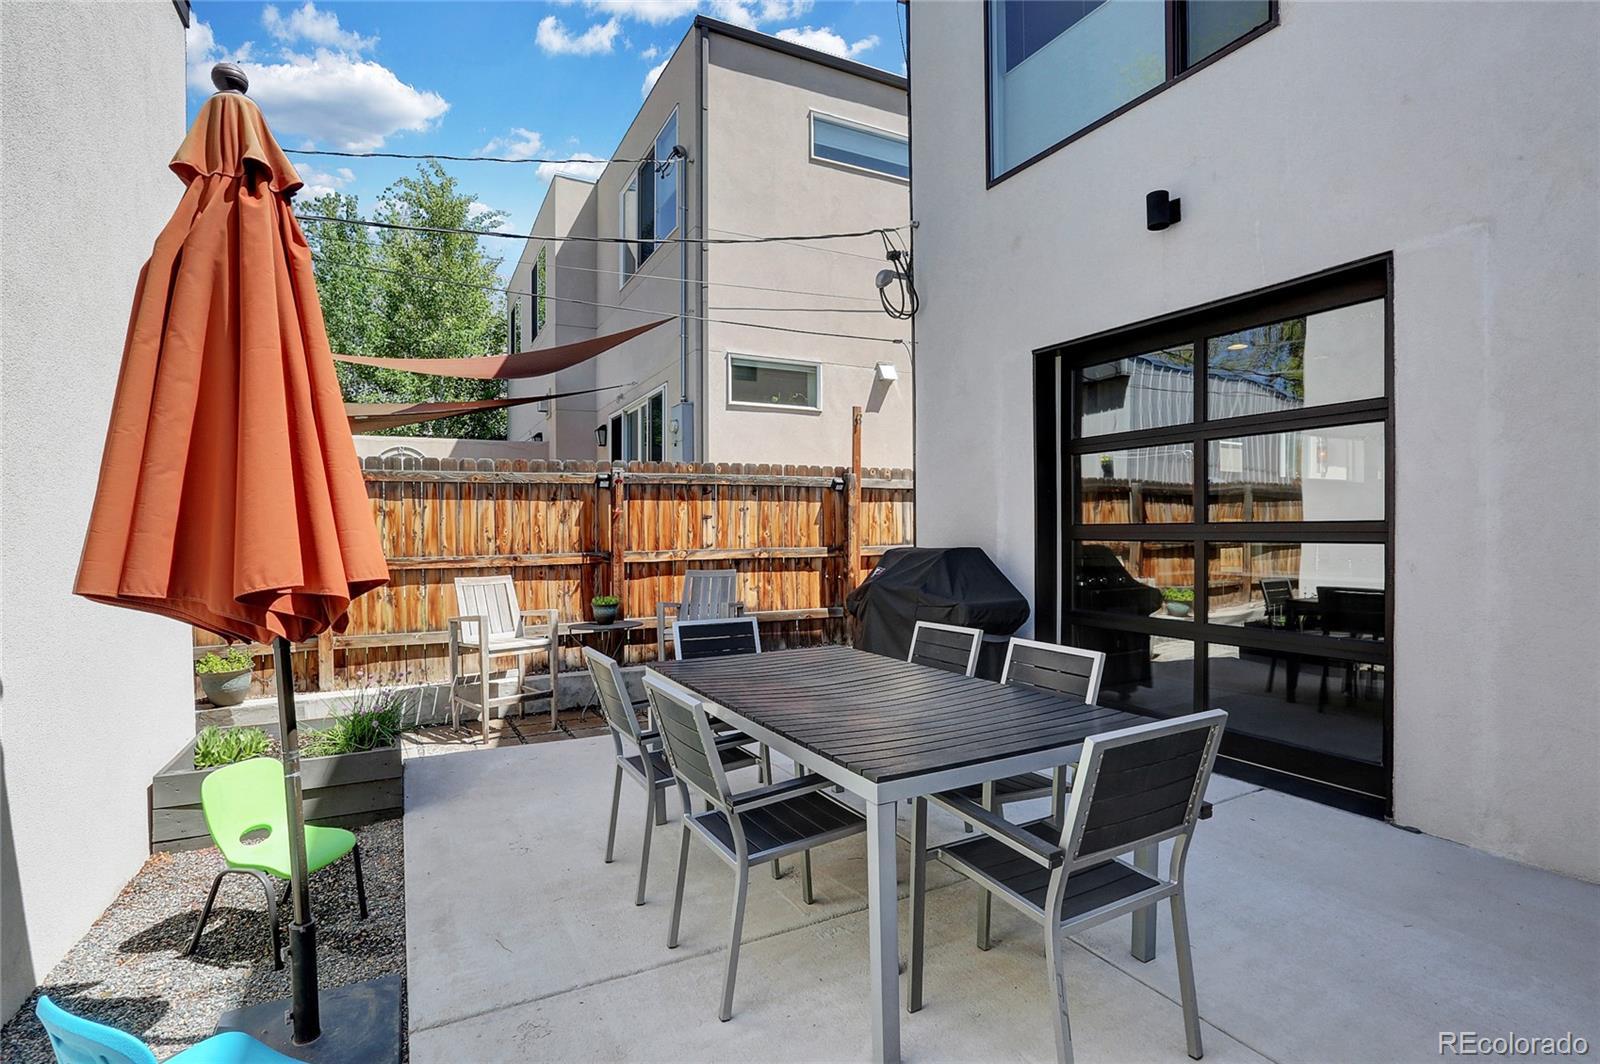 MLS# 2826114 - 6 - 2713 N Grove Street, Denver, CO 80211